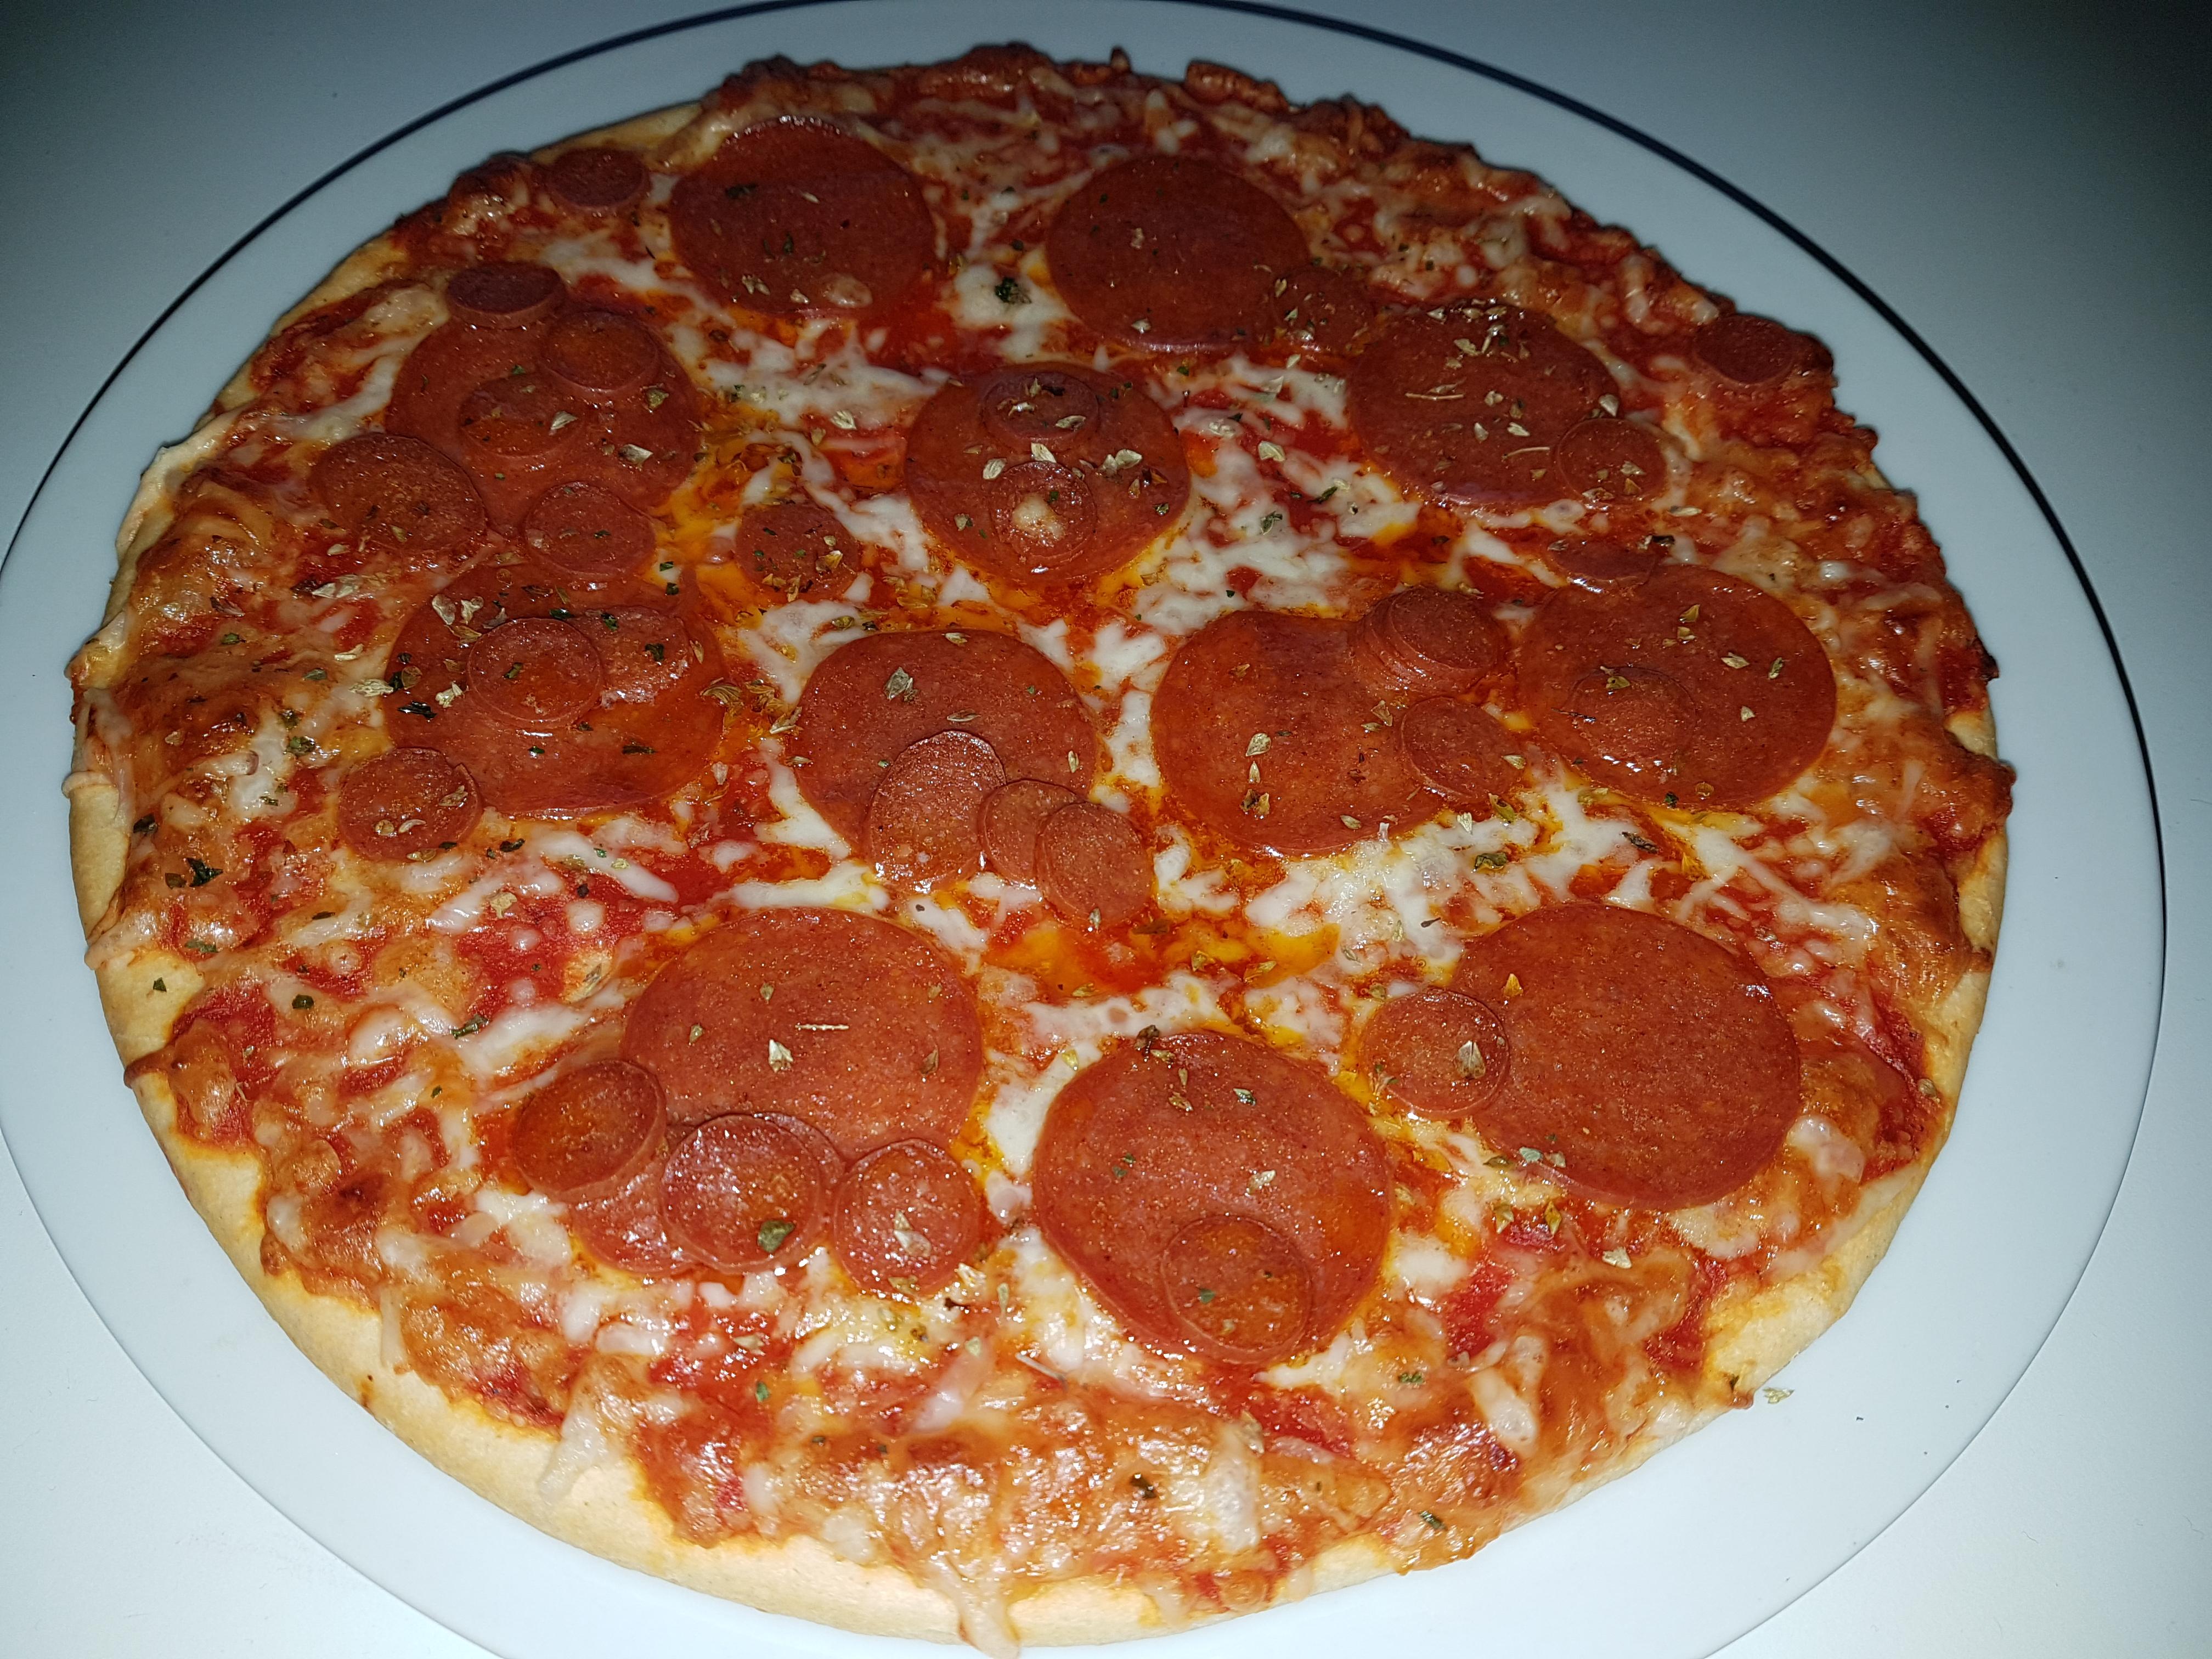 http://foodloader.net/Holz_2018-04-28_Pizza.jpg